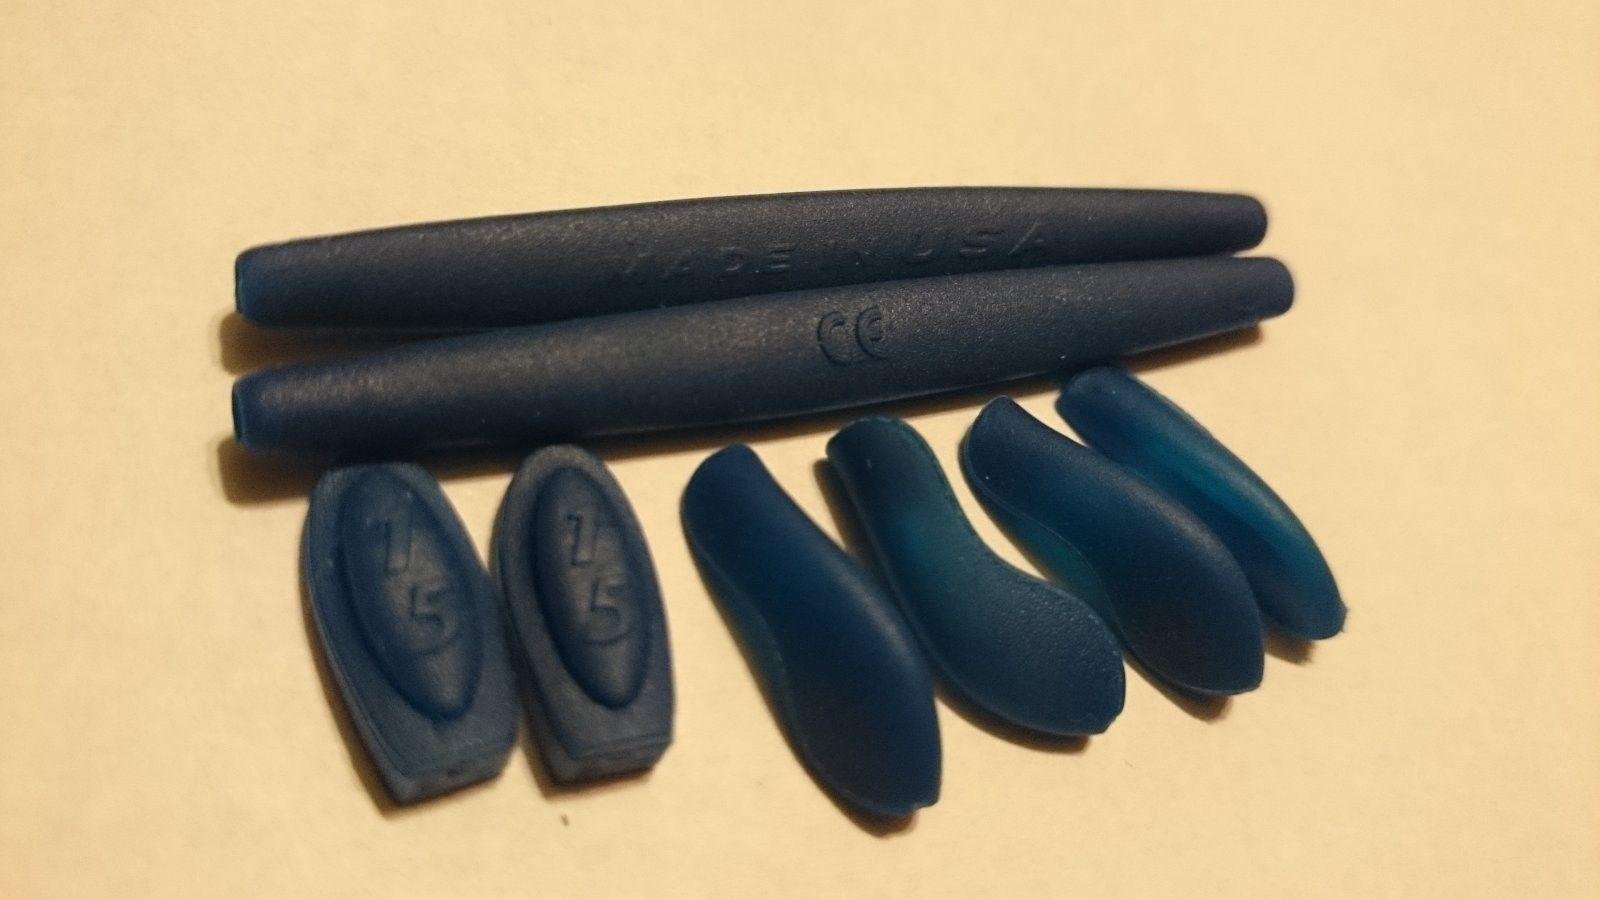 Blue OEM Rubber Set For Juliet - DSC_1188.JPG